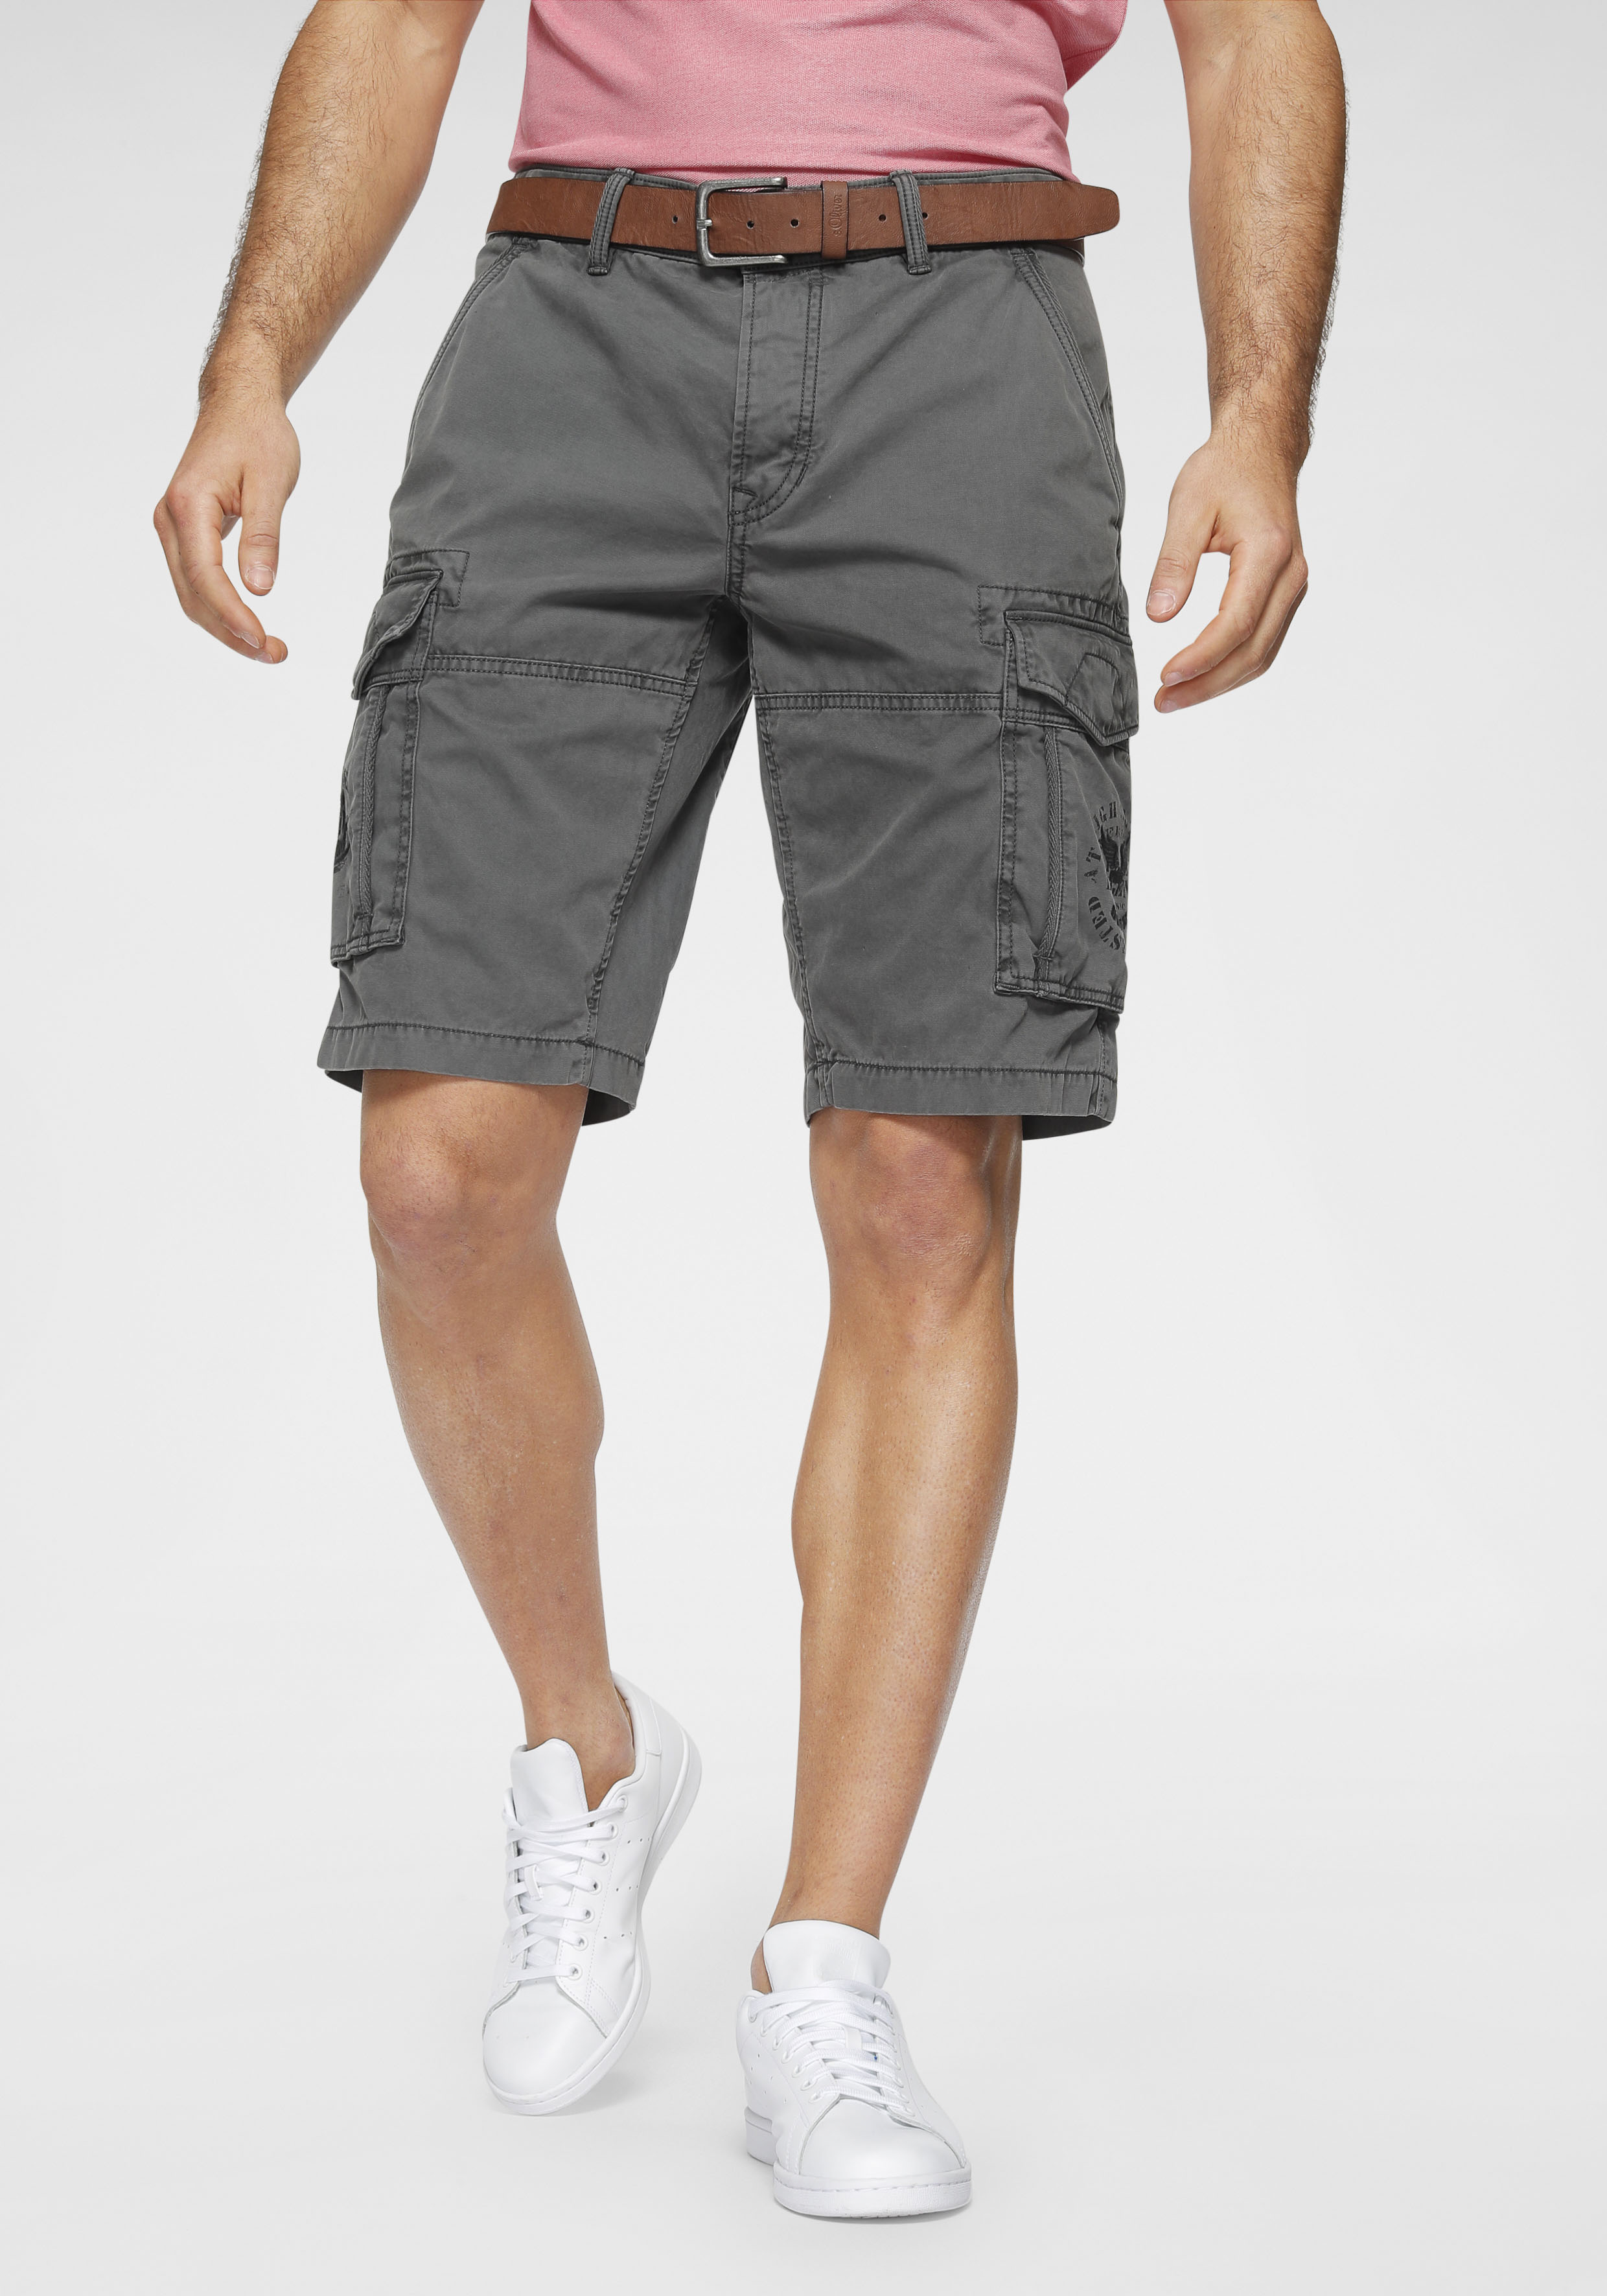 PME LEGEND Cargoshorts | Bekleidung > Shorts & Bermudas > Shorts | Pme Legend